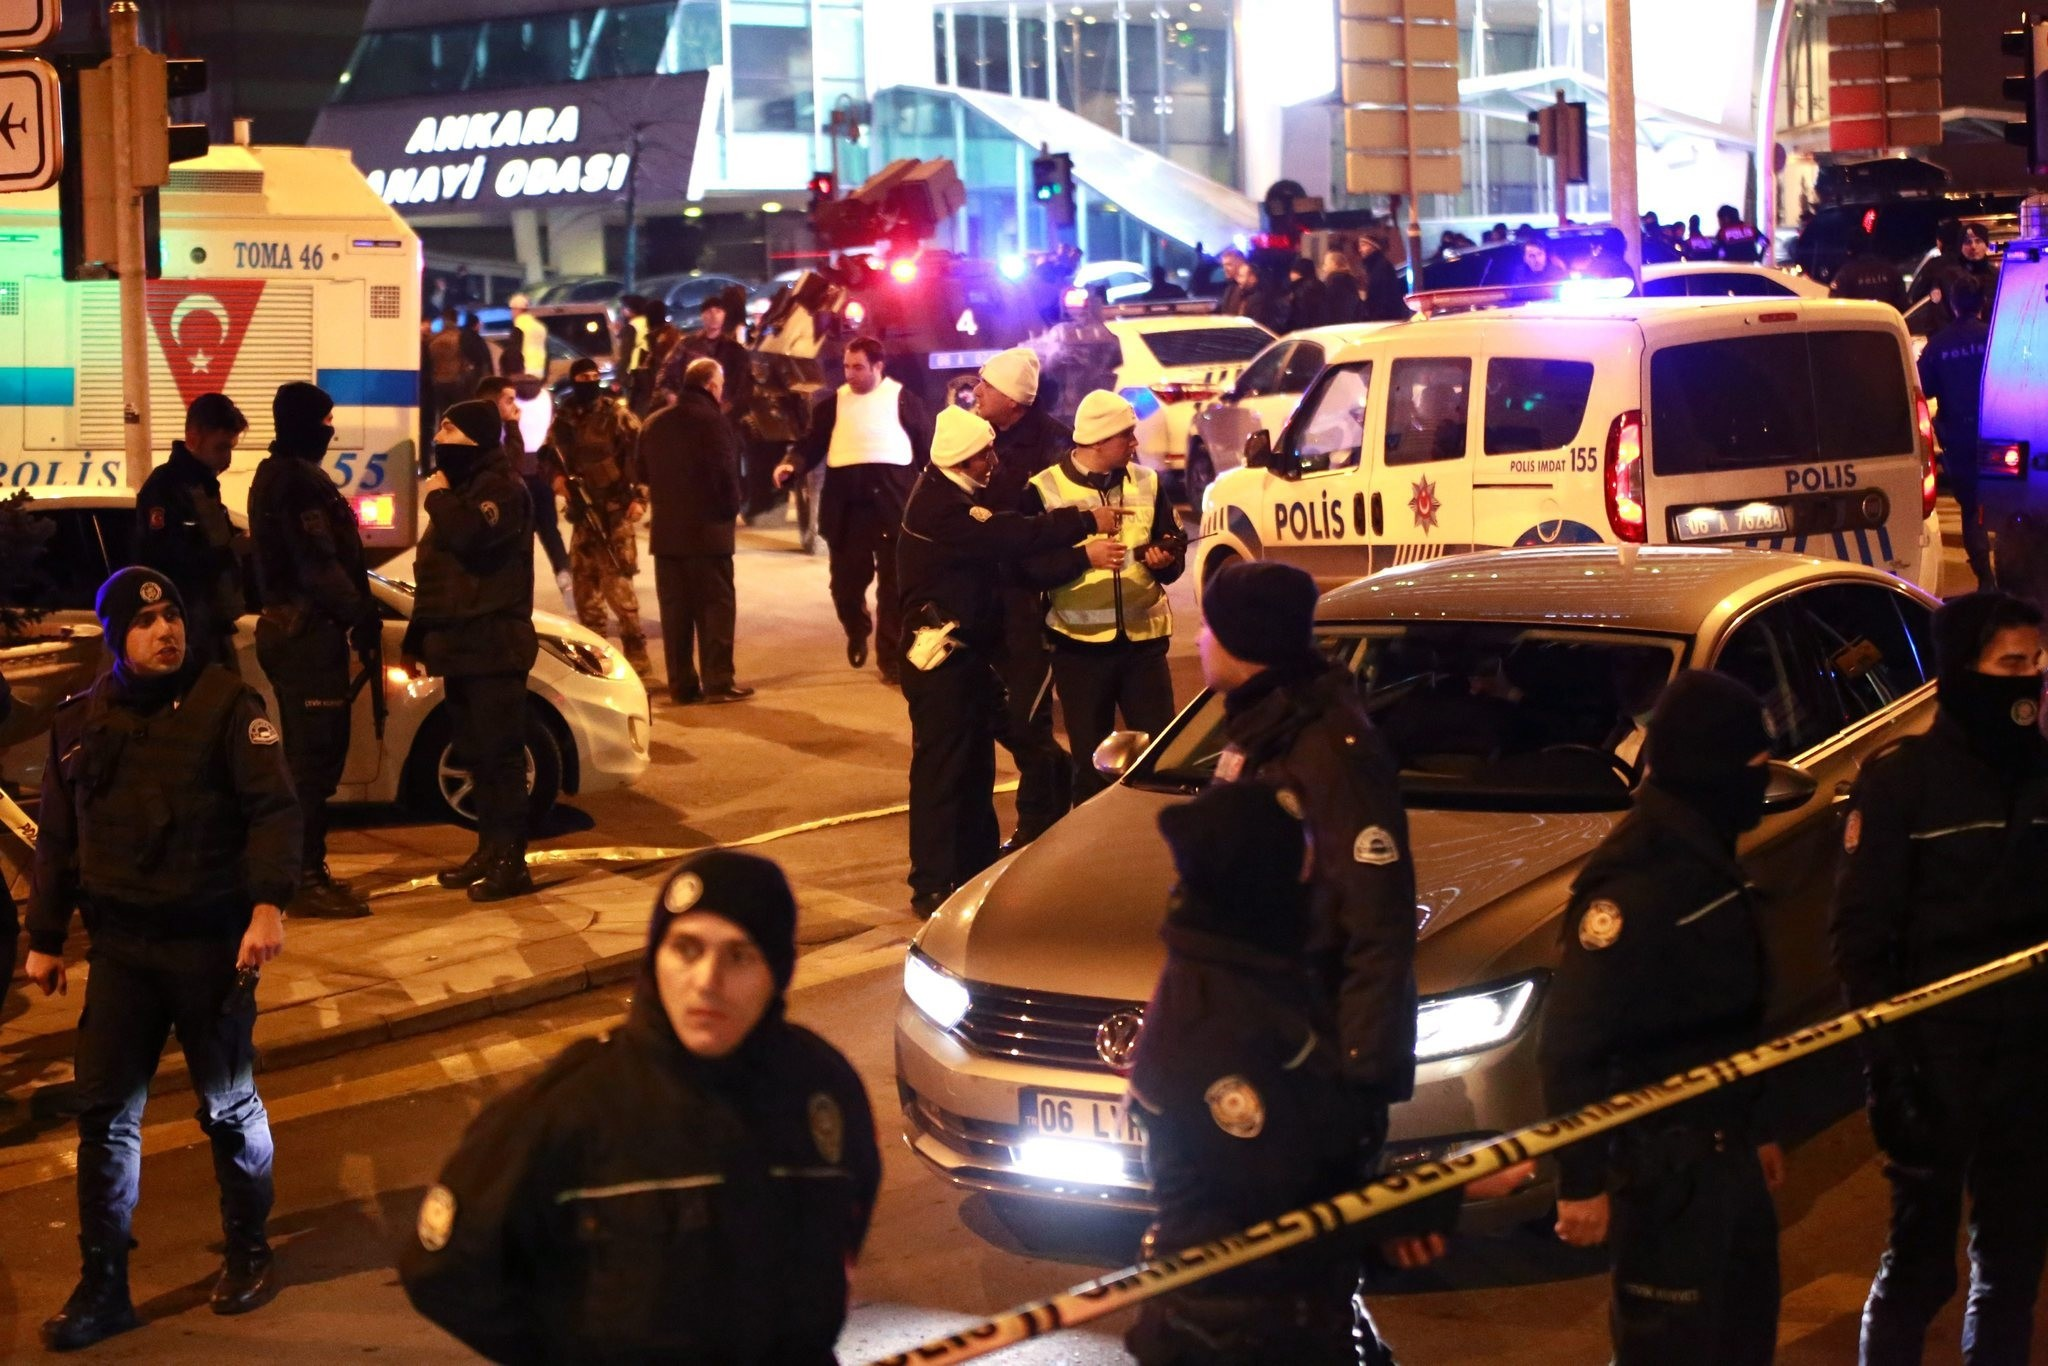 urkish police secure the area after Russia's ambassador to Turkey, Andrey Karlov has been shot, in Ankara, Turkey, 19 December 2016. (EPA Photo)